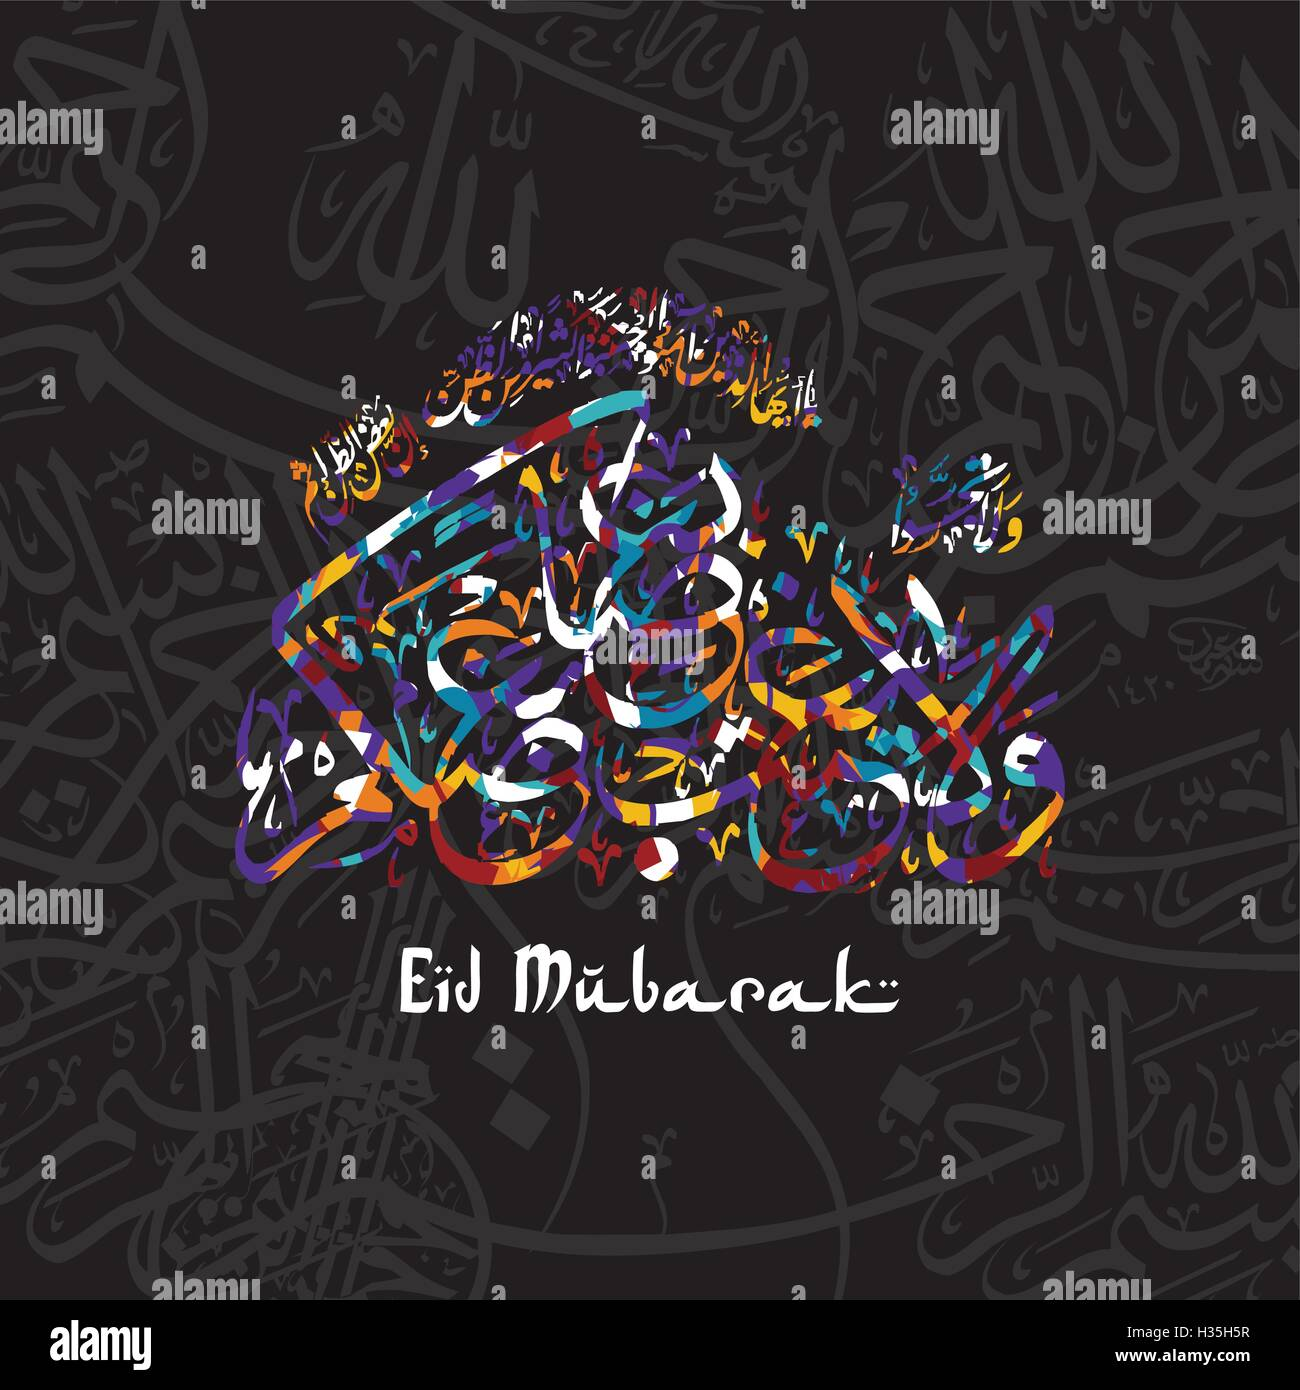 Gracious greetings stock photos gracious greetings stock images happy eid mubarak greetings arabic calligraphy art stock image m4hsunfo